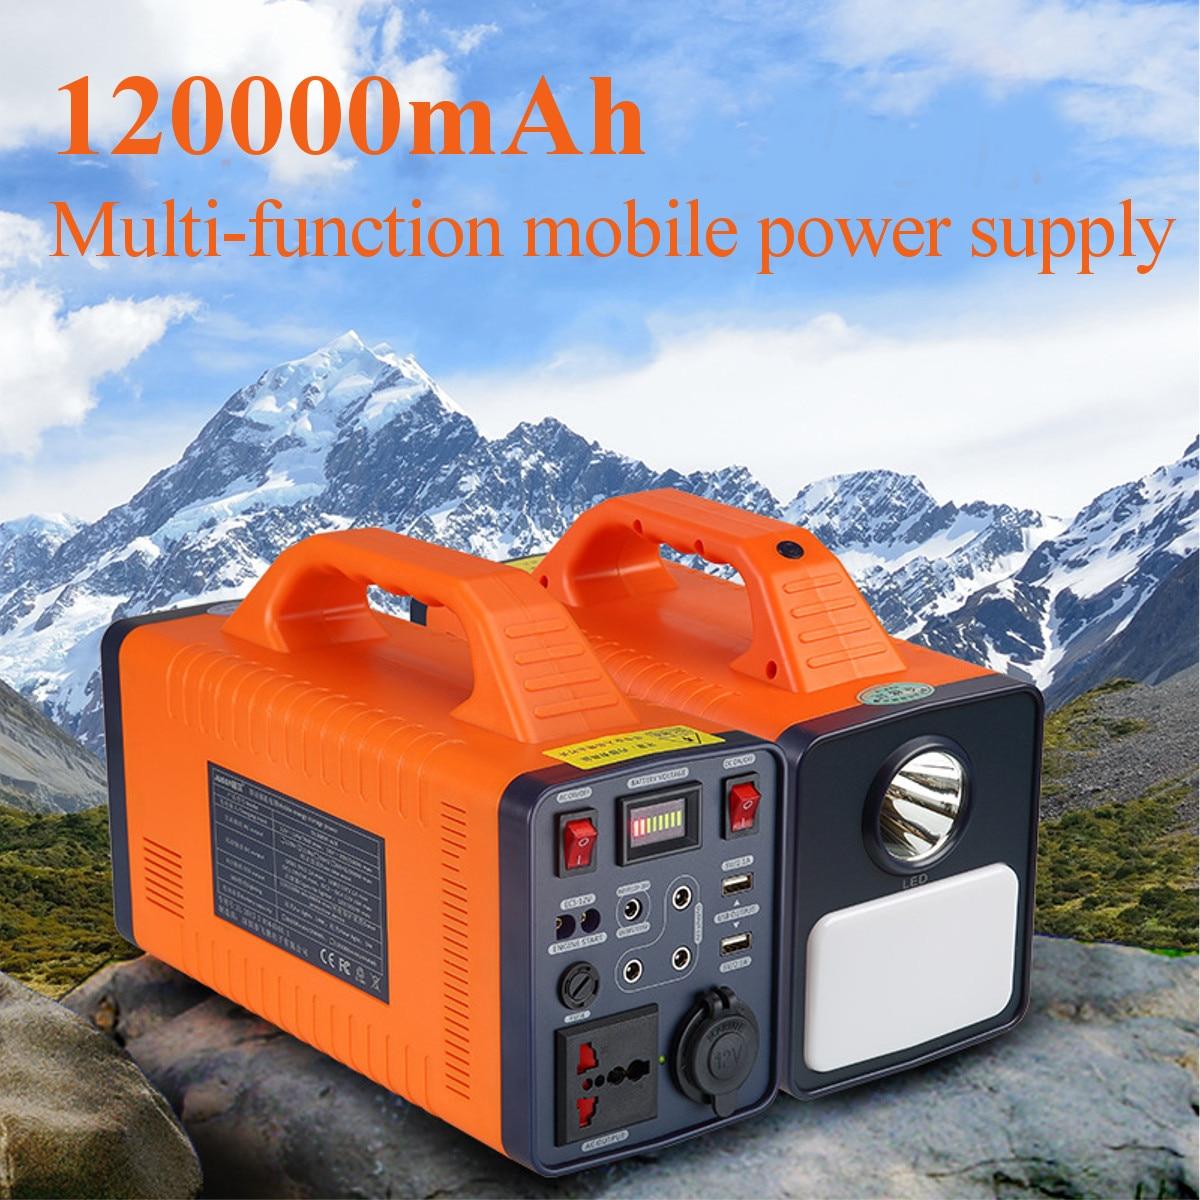 цена на 120000mAh 444Wh 300W Portable Solar Power Storage Generator Inverter Camping Light Multifunction Portable Mobile Power Supply